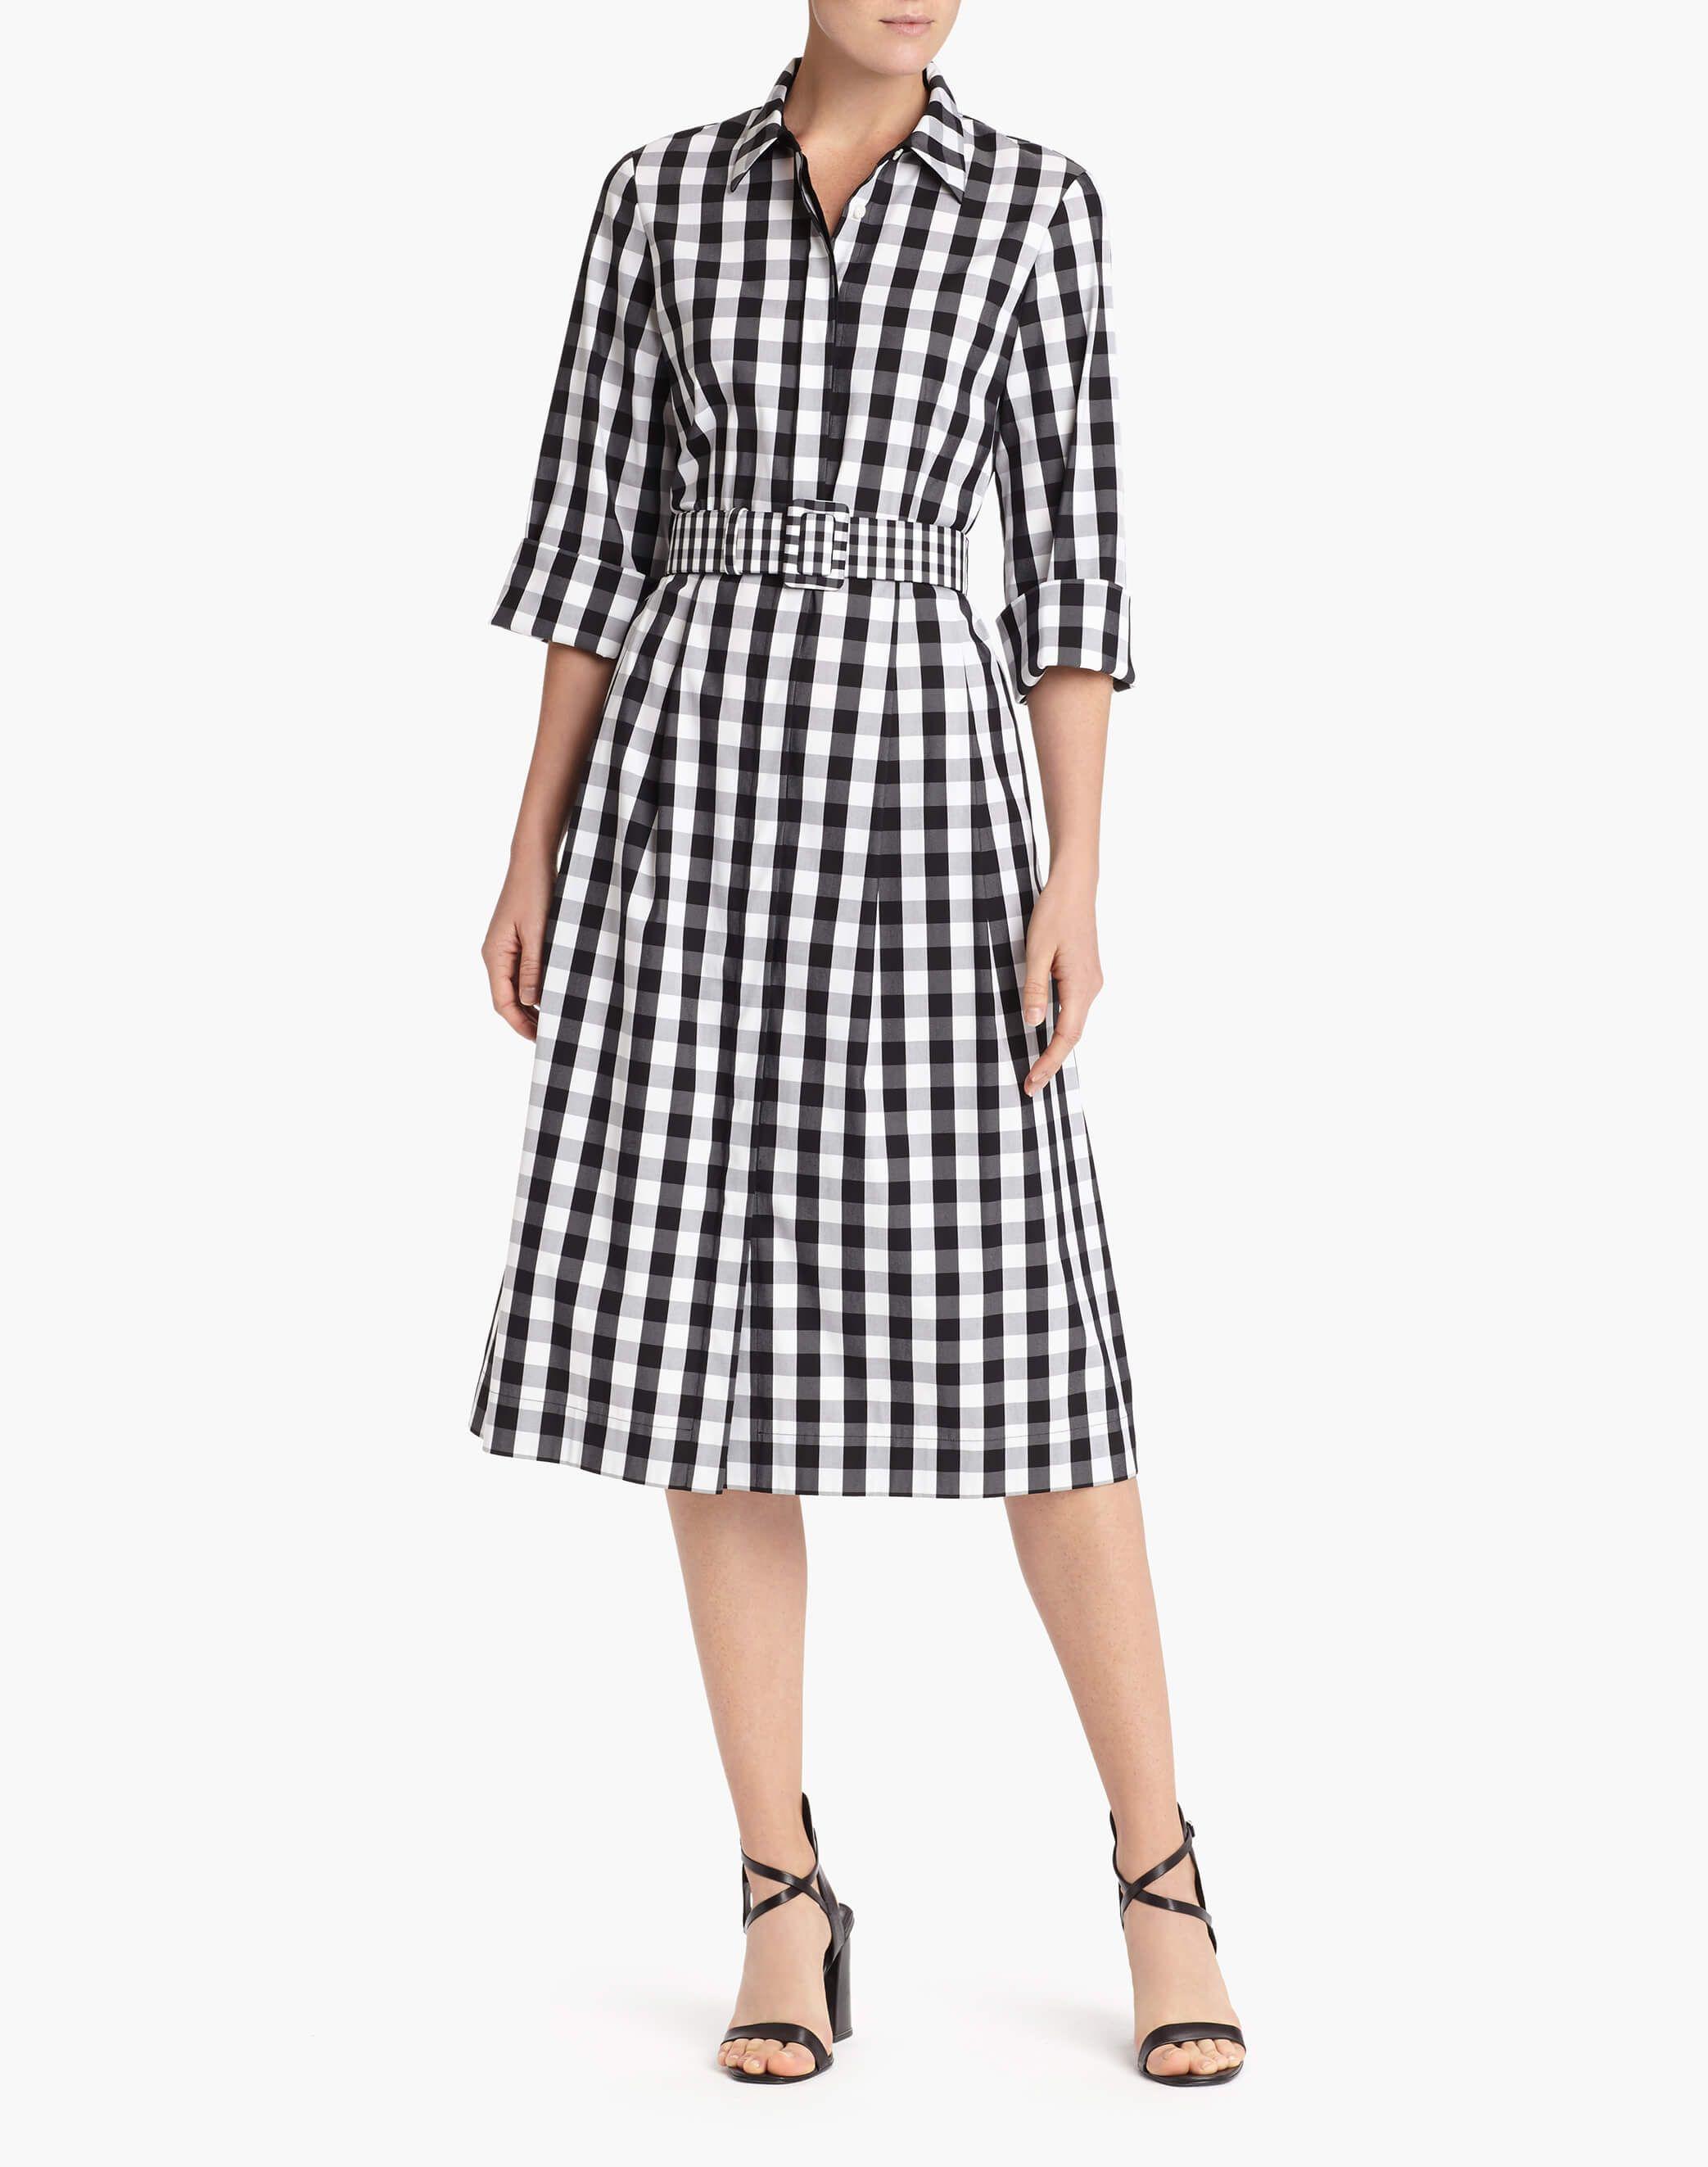 858991f5869c Belmont Check Shirting Eleni Dress - Dresses - Women - Clothing ...